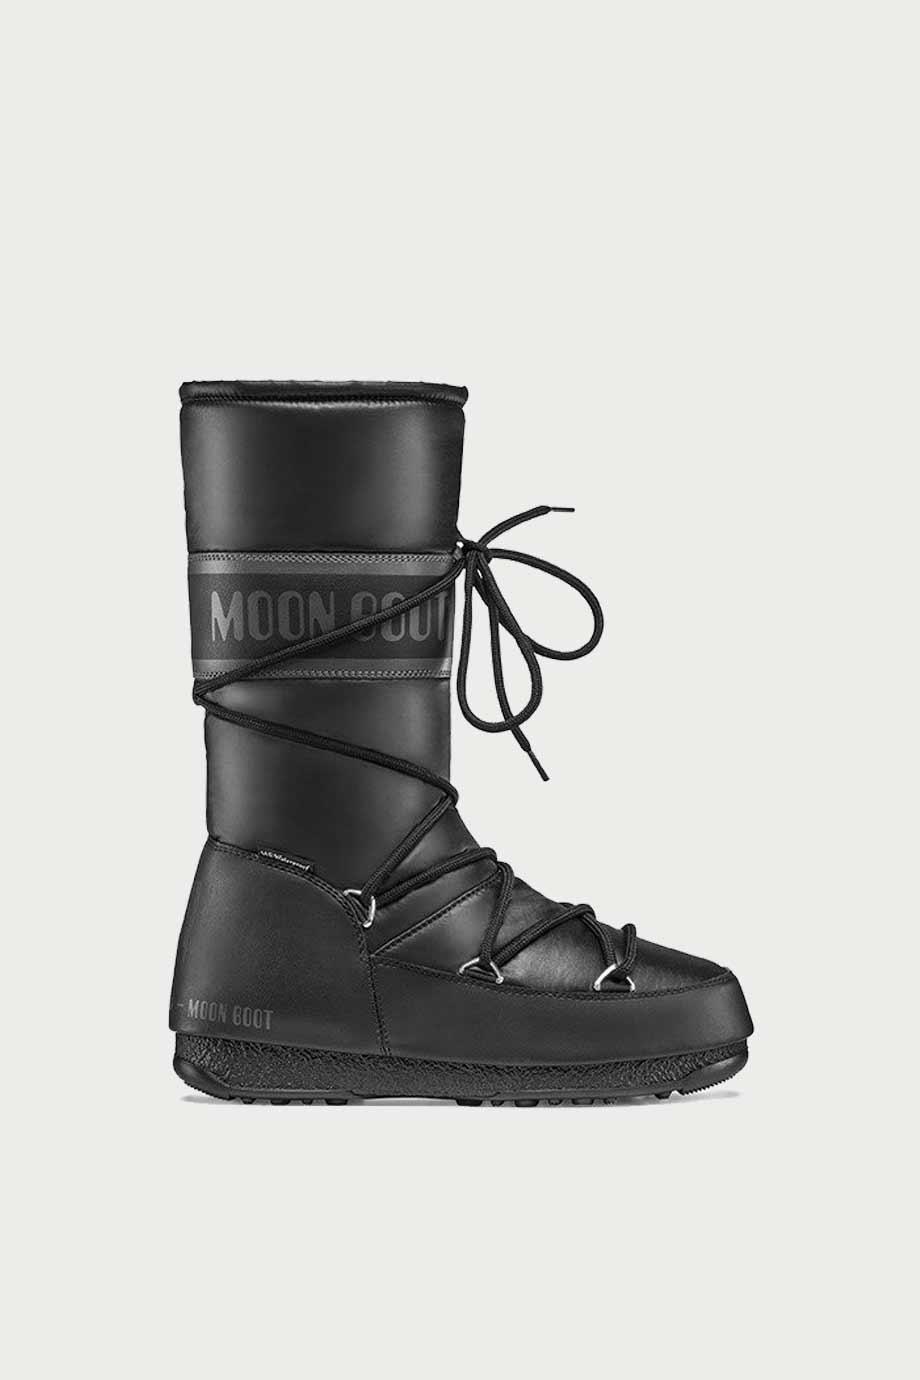 spiridoula metheniti shoes xalkida p 24009100 001 black high laces MoonBoot 2